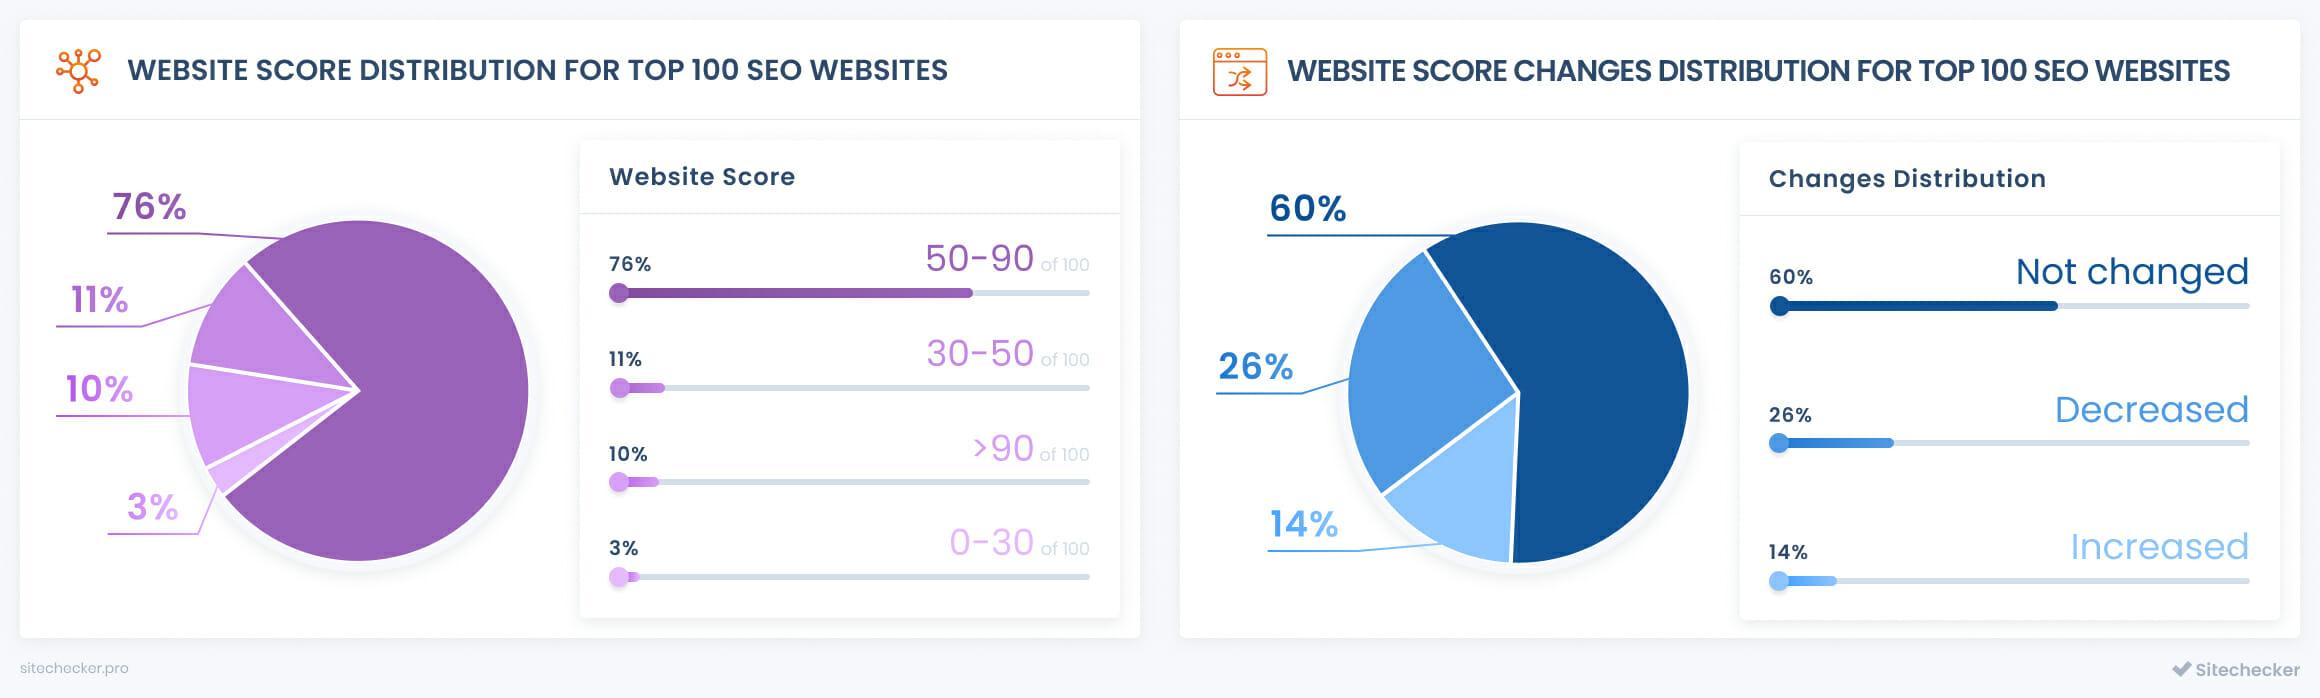 top seo companies website score distribution